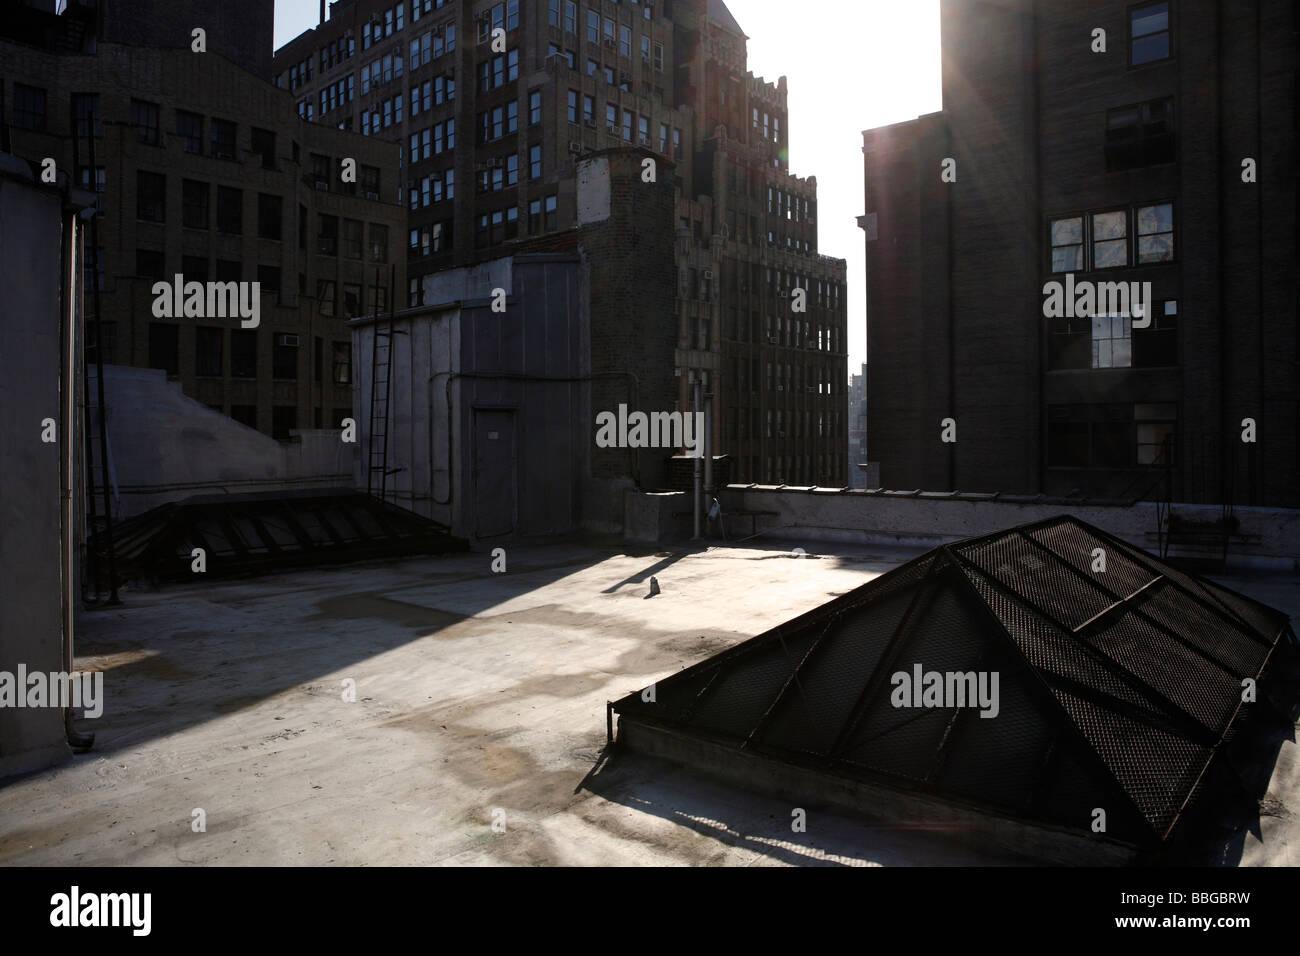 sunlight hitting New York rooftop - Stock Image